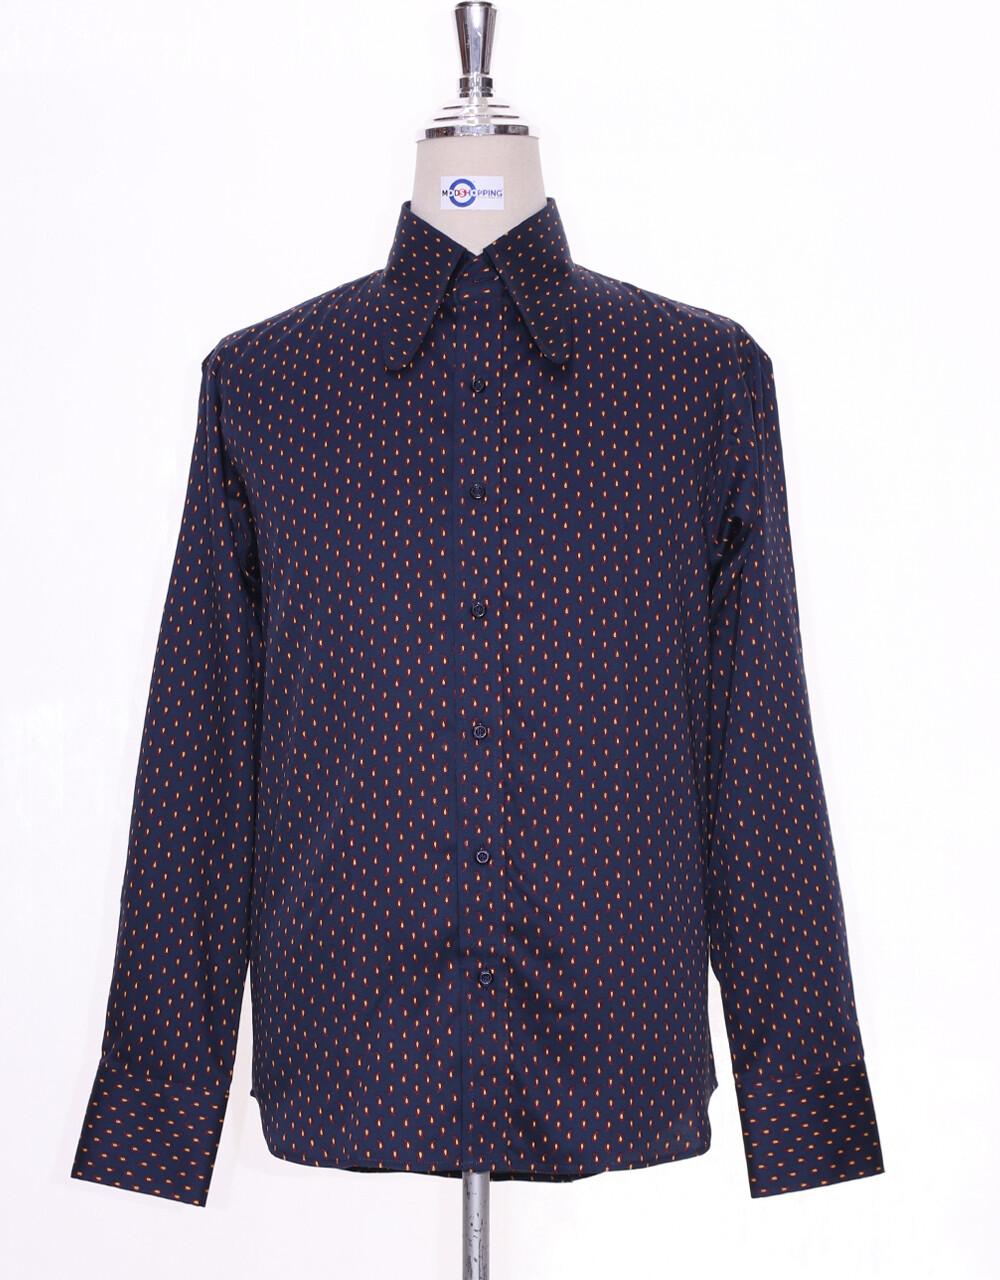 Hight Collar Shirt  | Navy Blue Small Paisley Shirt